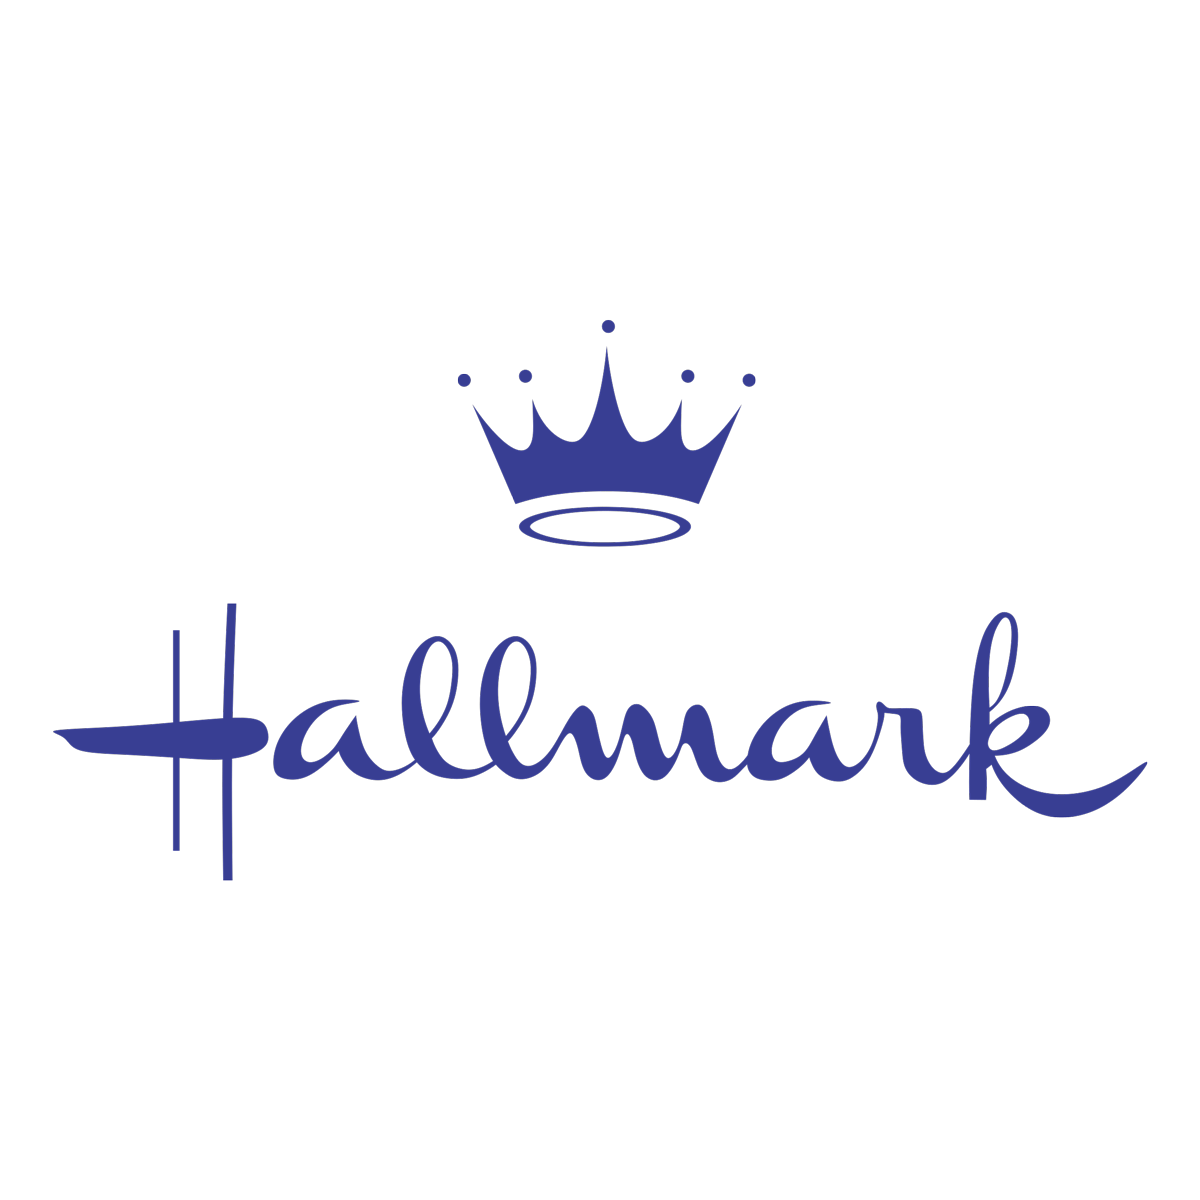 hallmark-logo-transparent